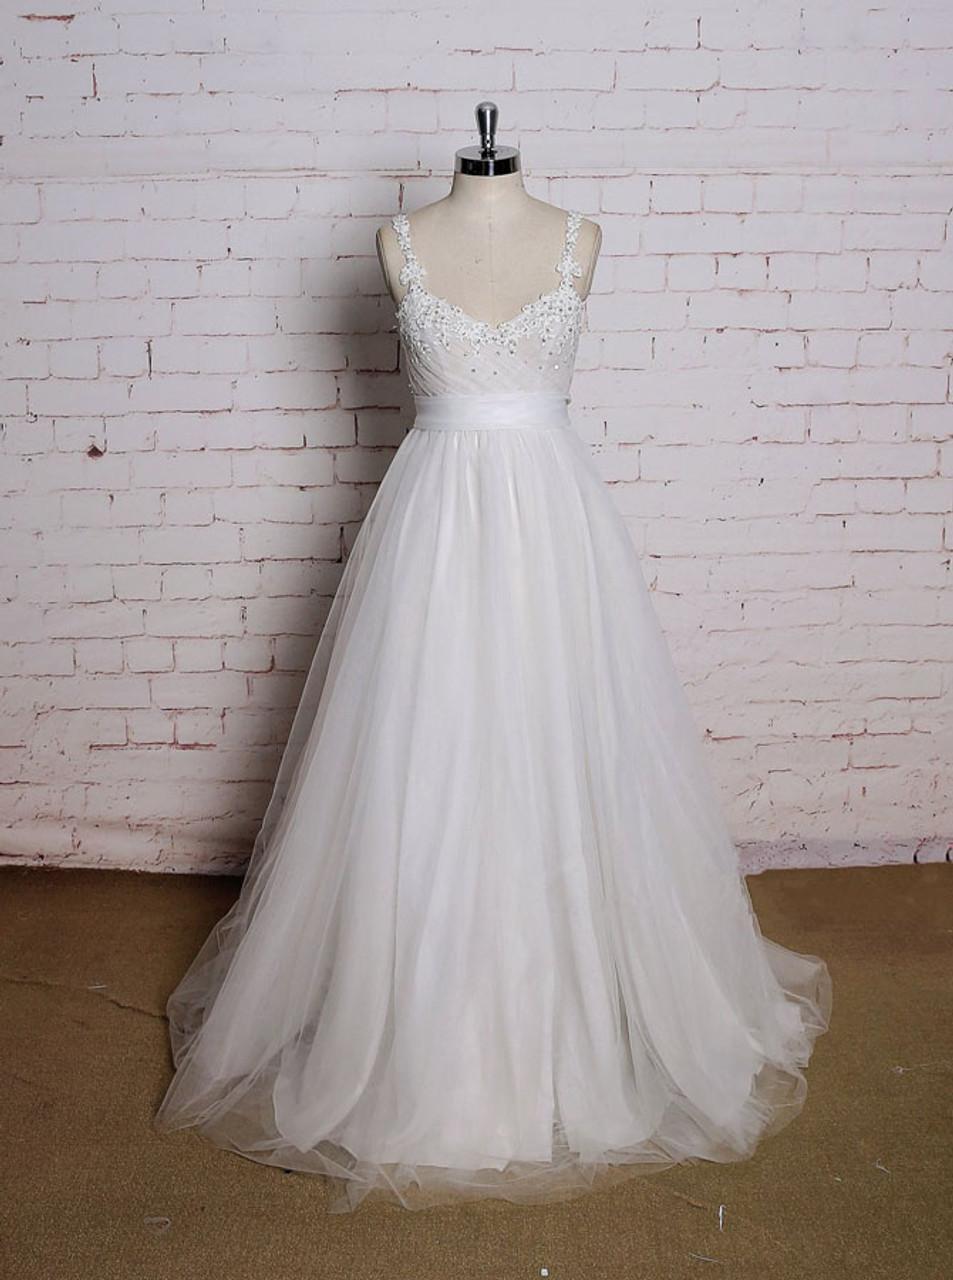 Tulle A-Line Wedding Dress